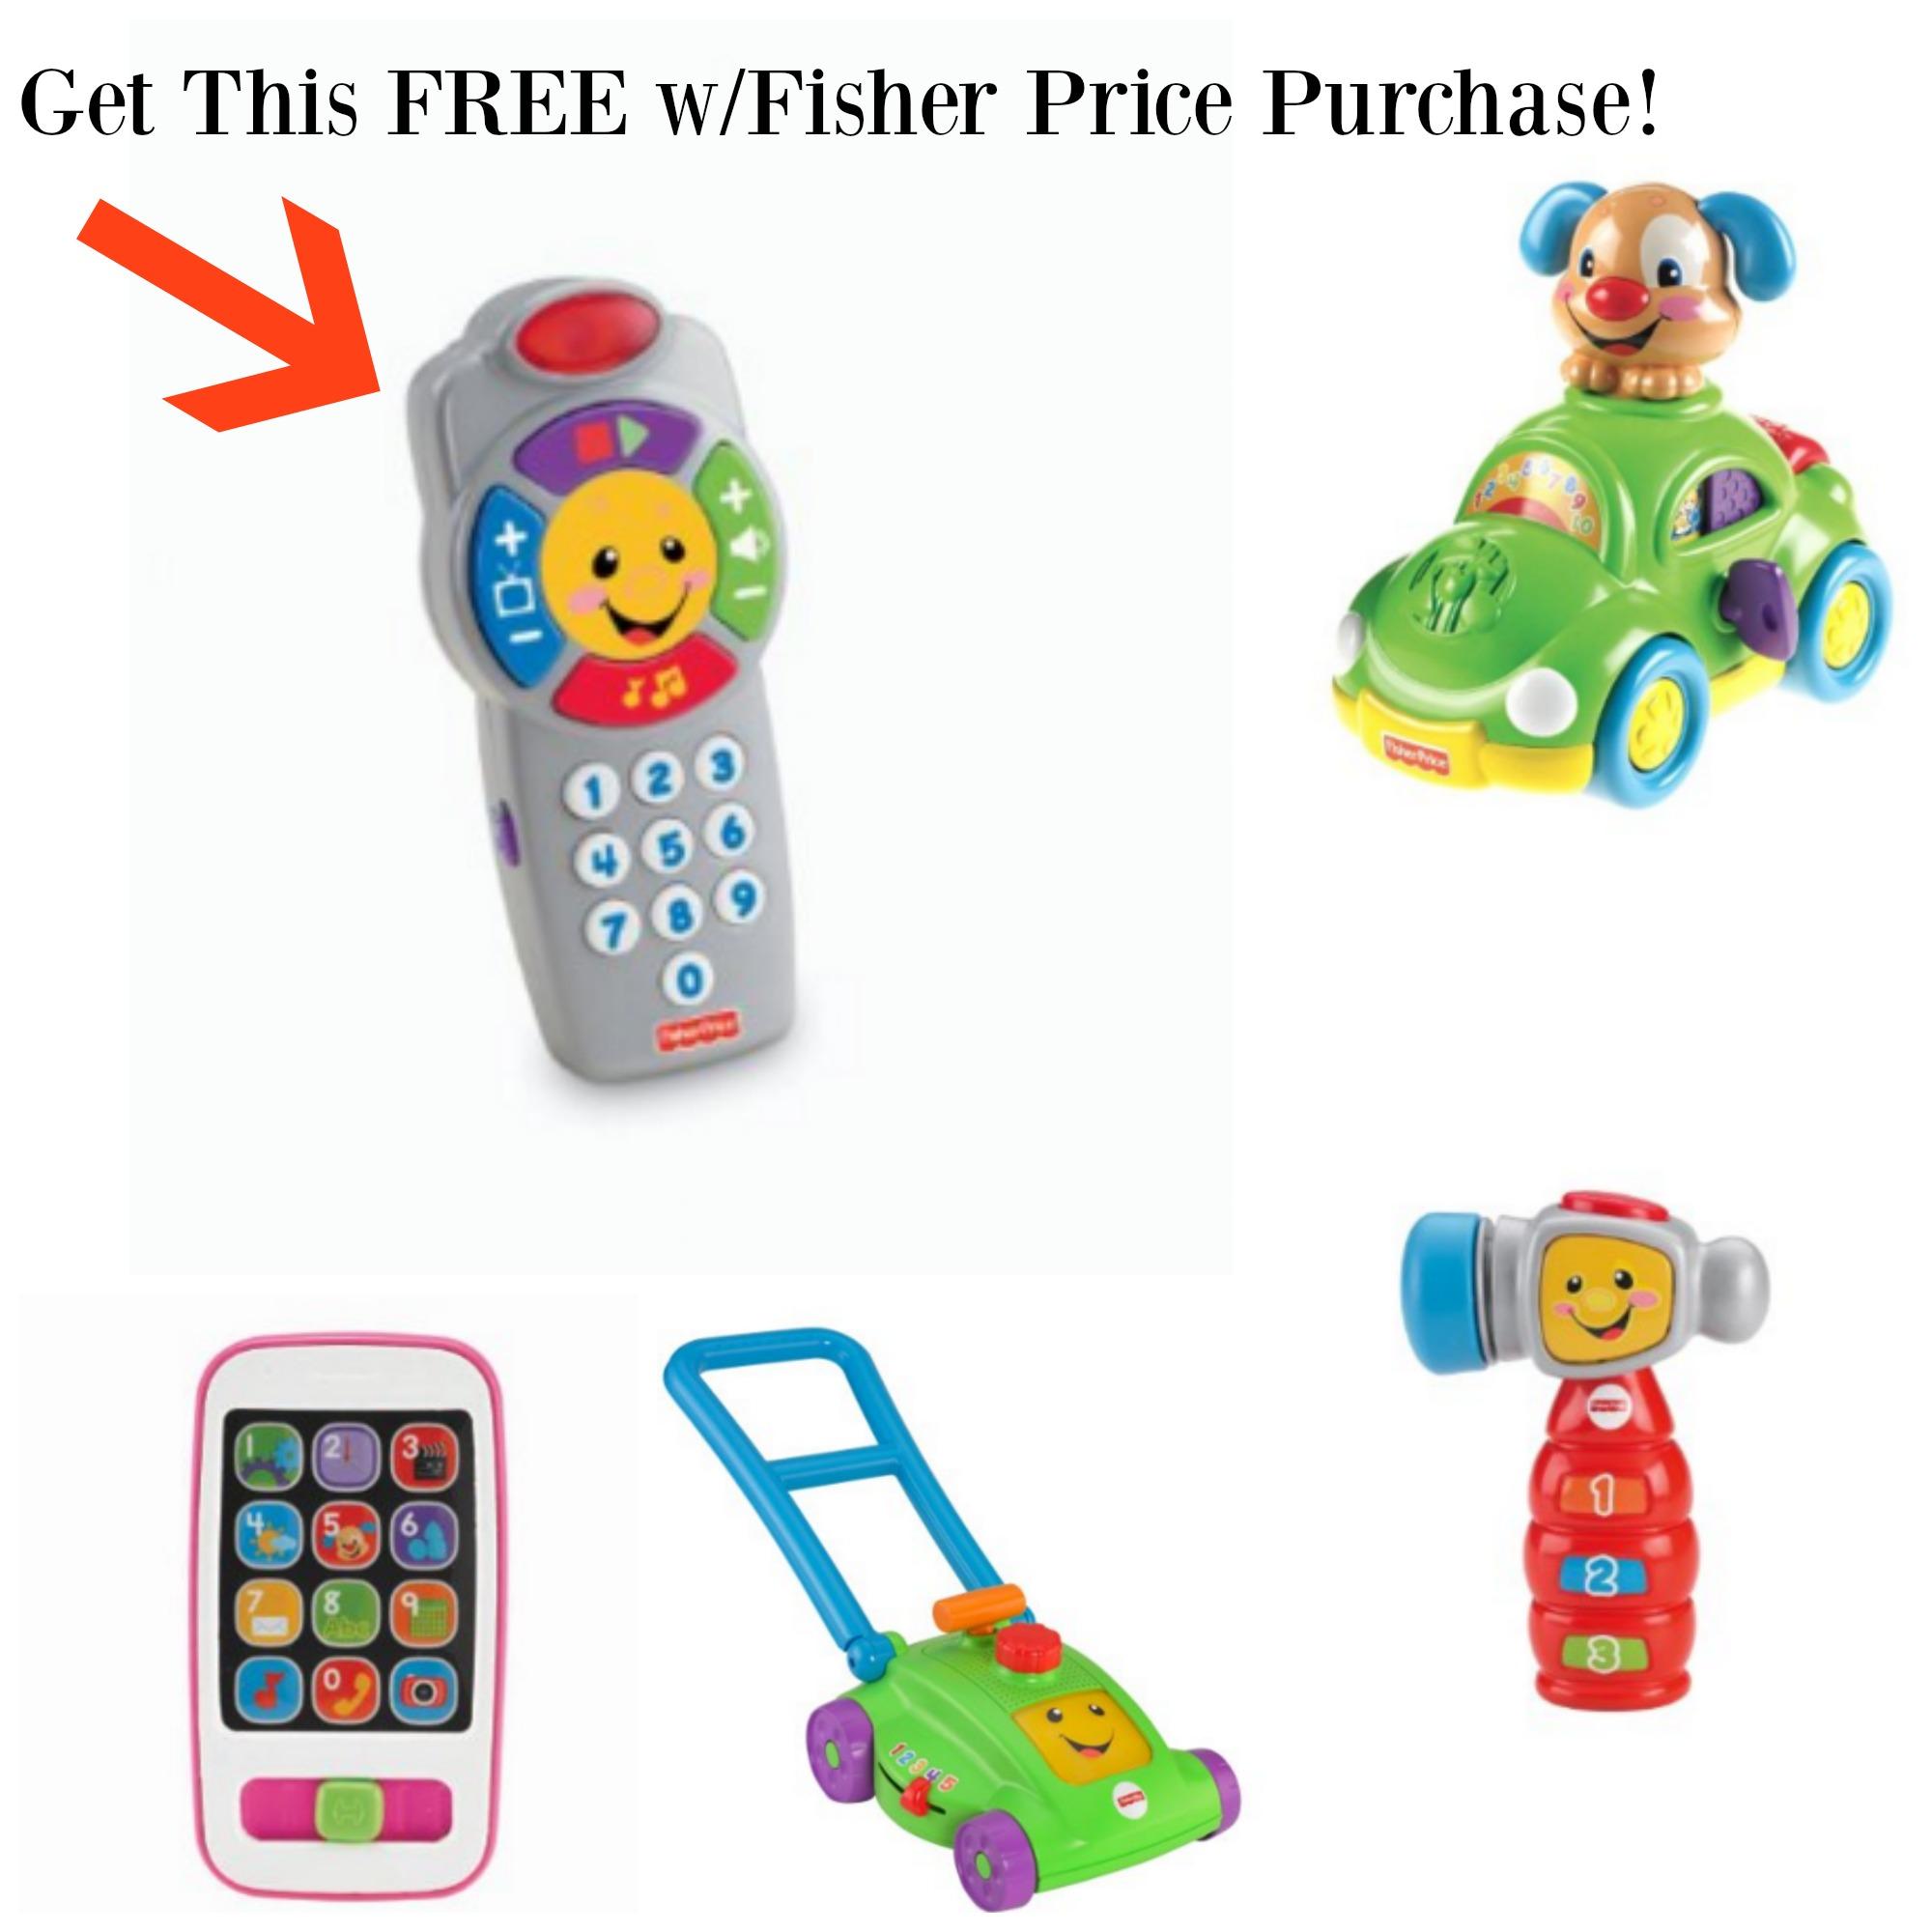 Mattel and Fisher-Price Customer Service